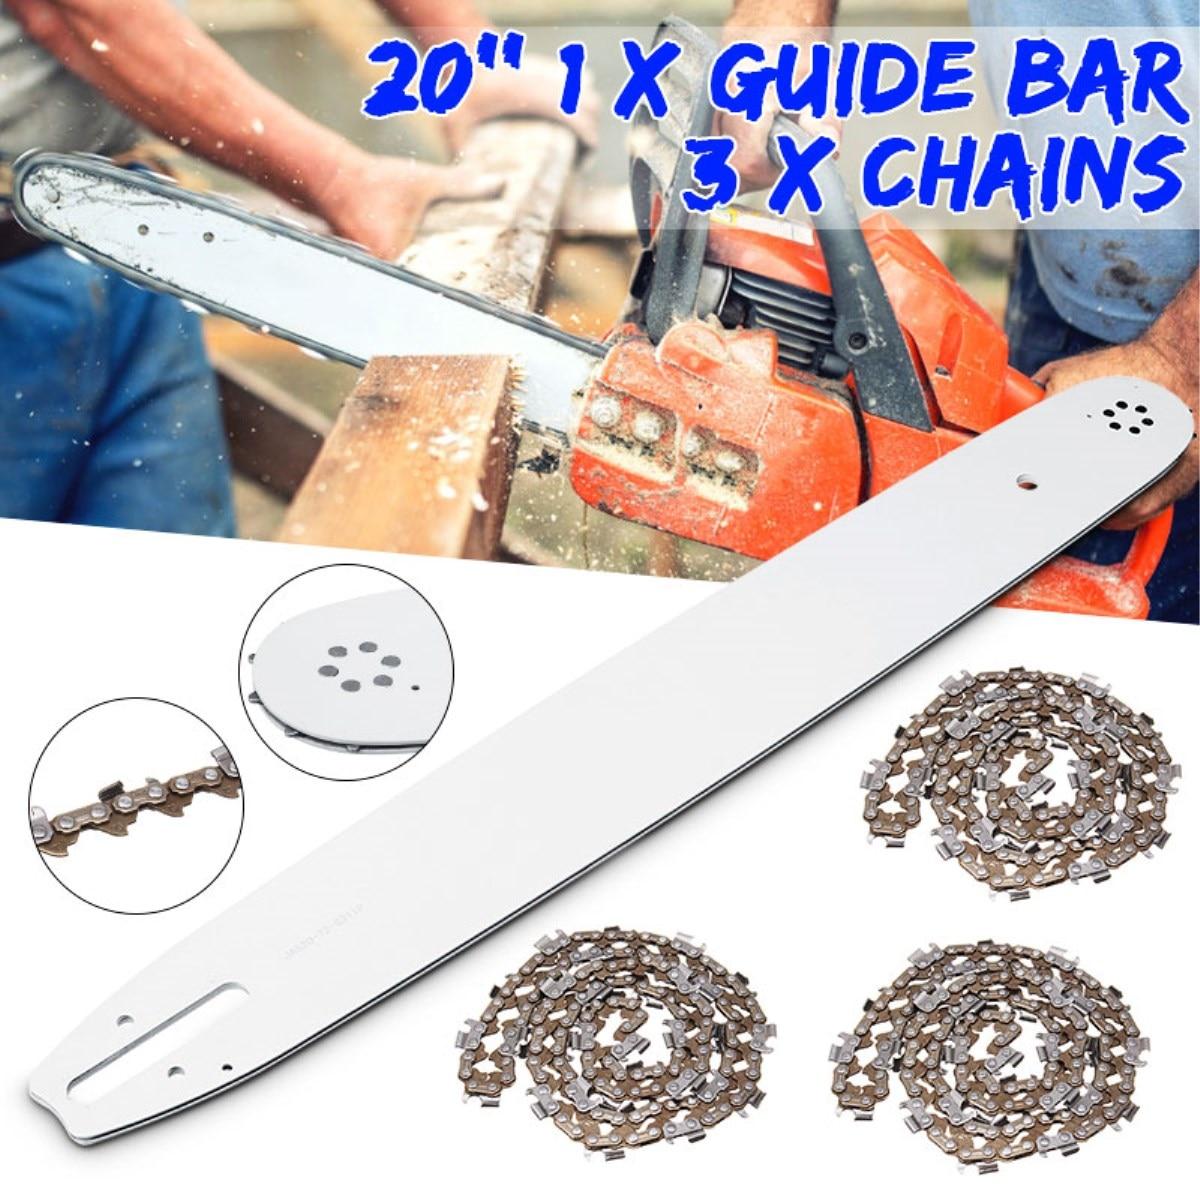 "20"" Guide Bar And 325 058 76DL Chains For Baumr-Ag SX62 SX66 62CC 66CC Chainsaw Chain Saw Accessories(China)"